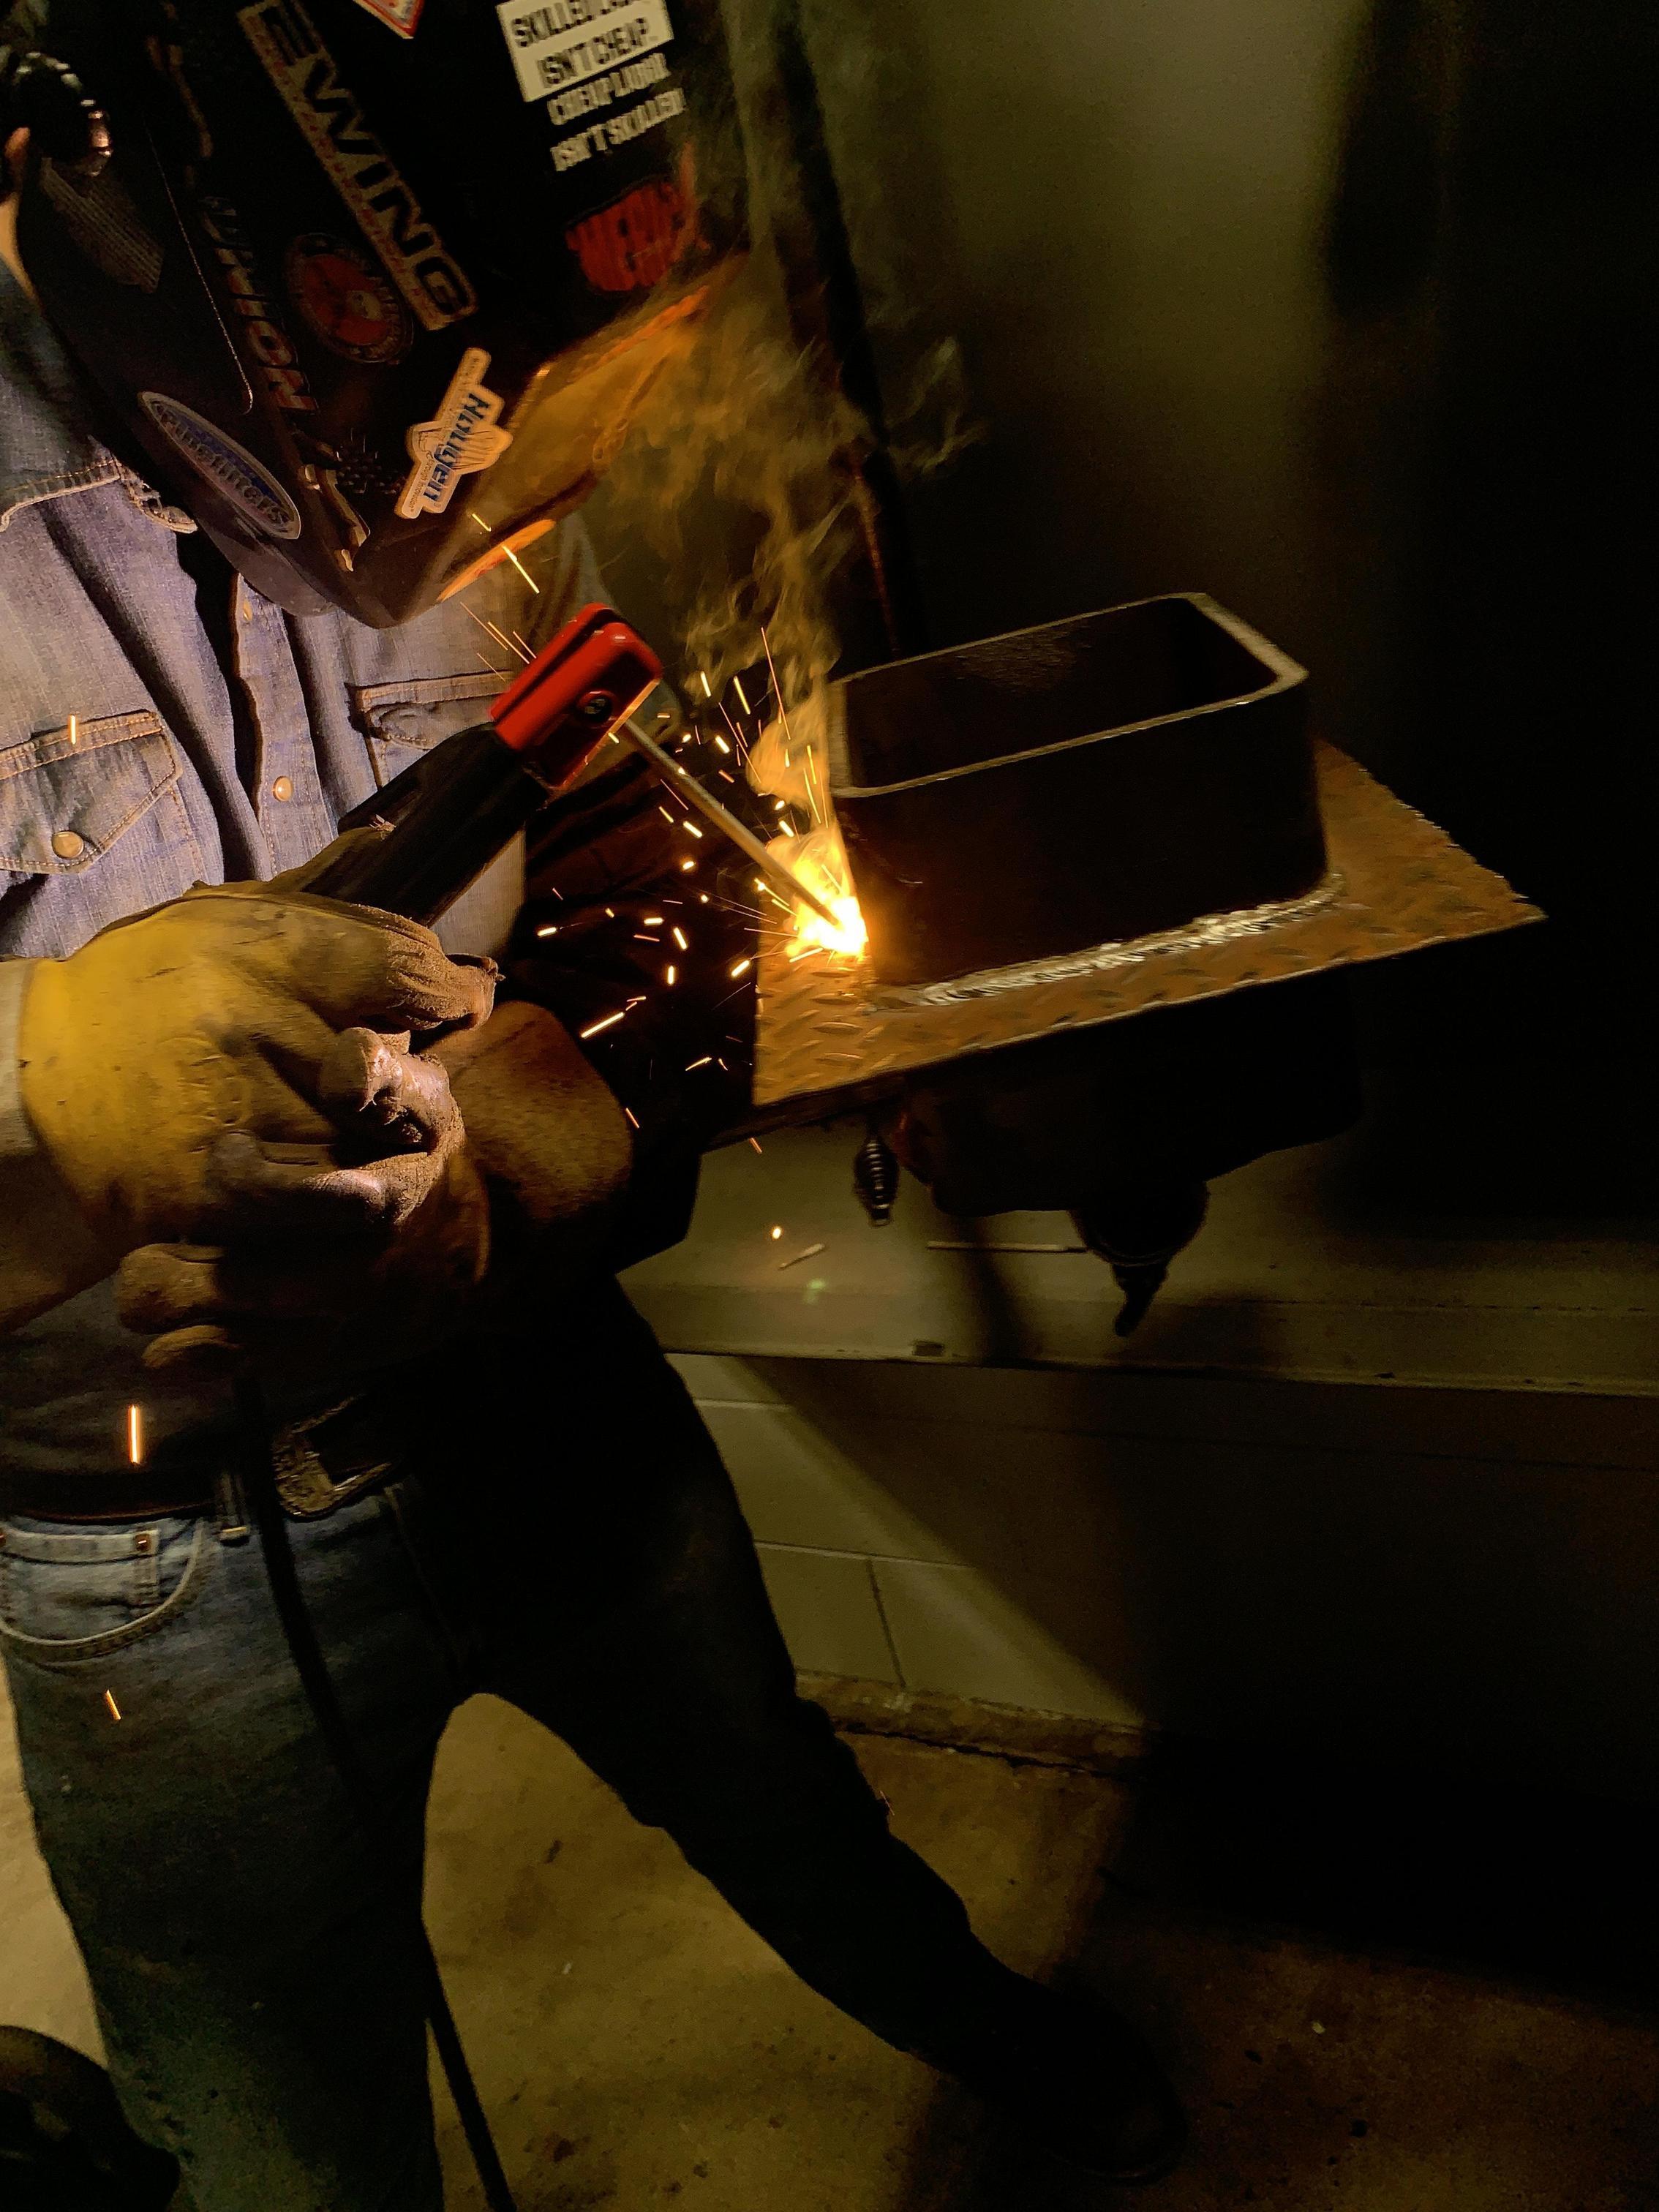 Student demonstrating stick welding.